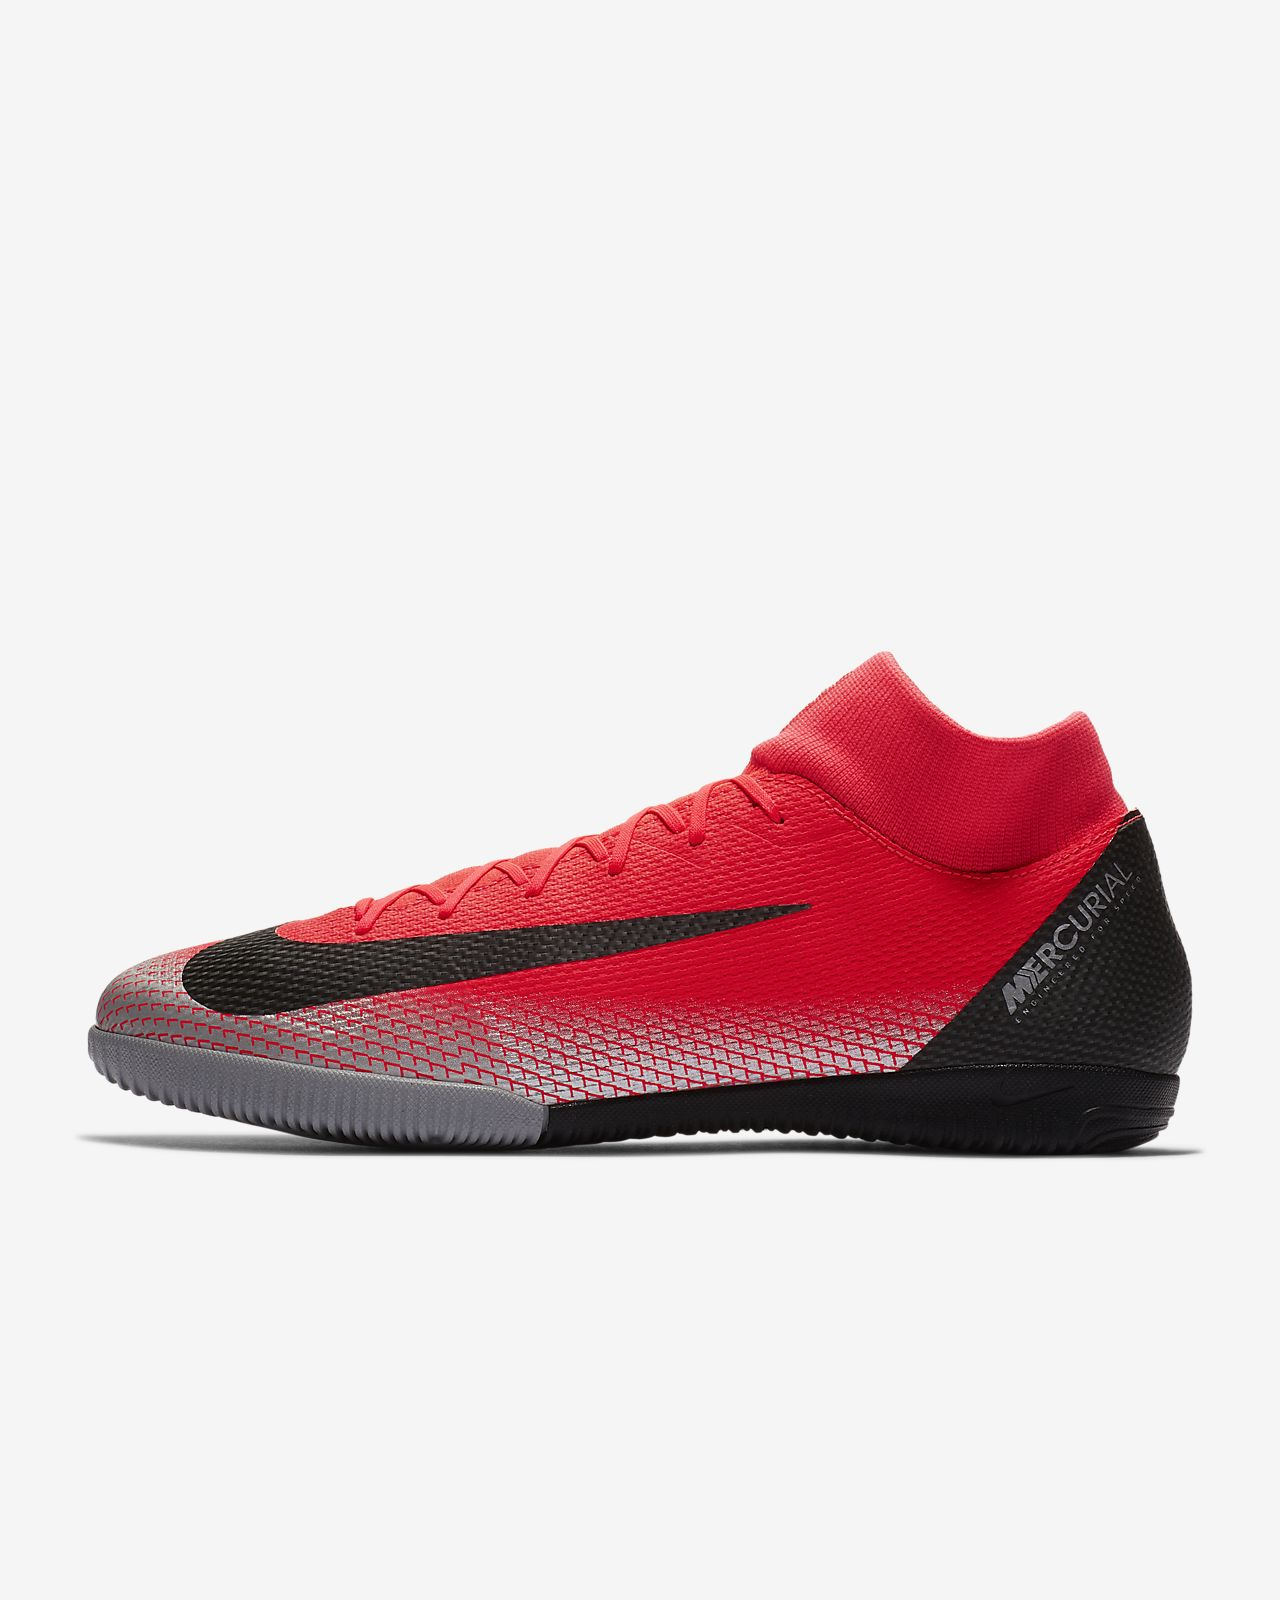 747f8150aca7 Nike SuperflyX 6 Academy IC Indoor Court Football Shoe. Nike.com MY